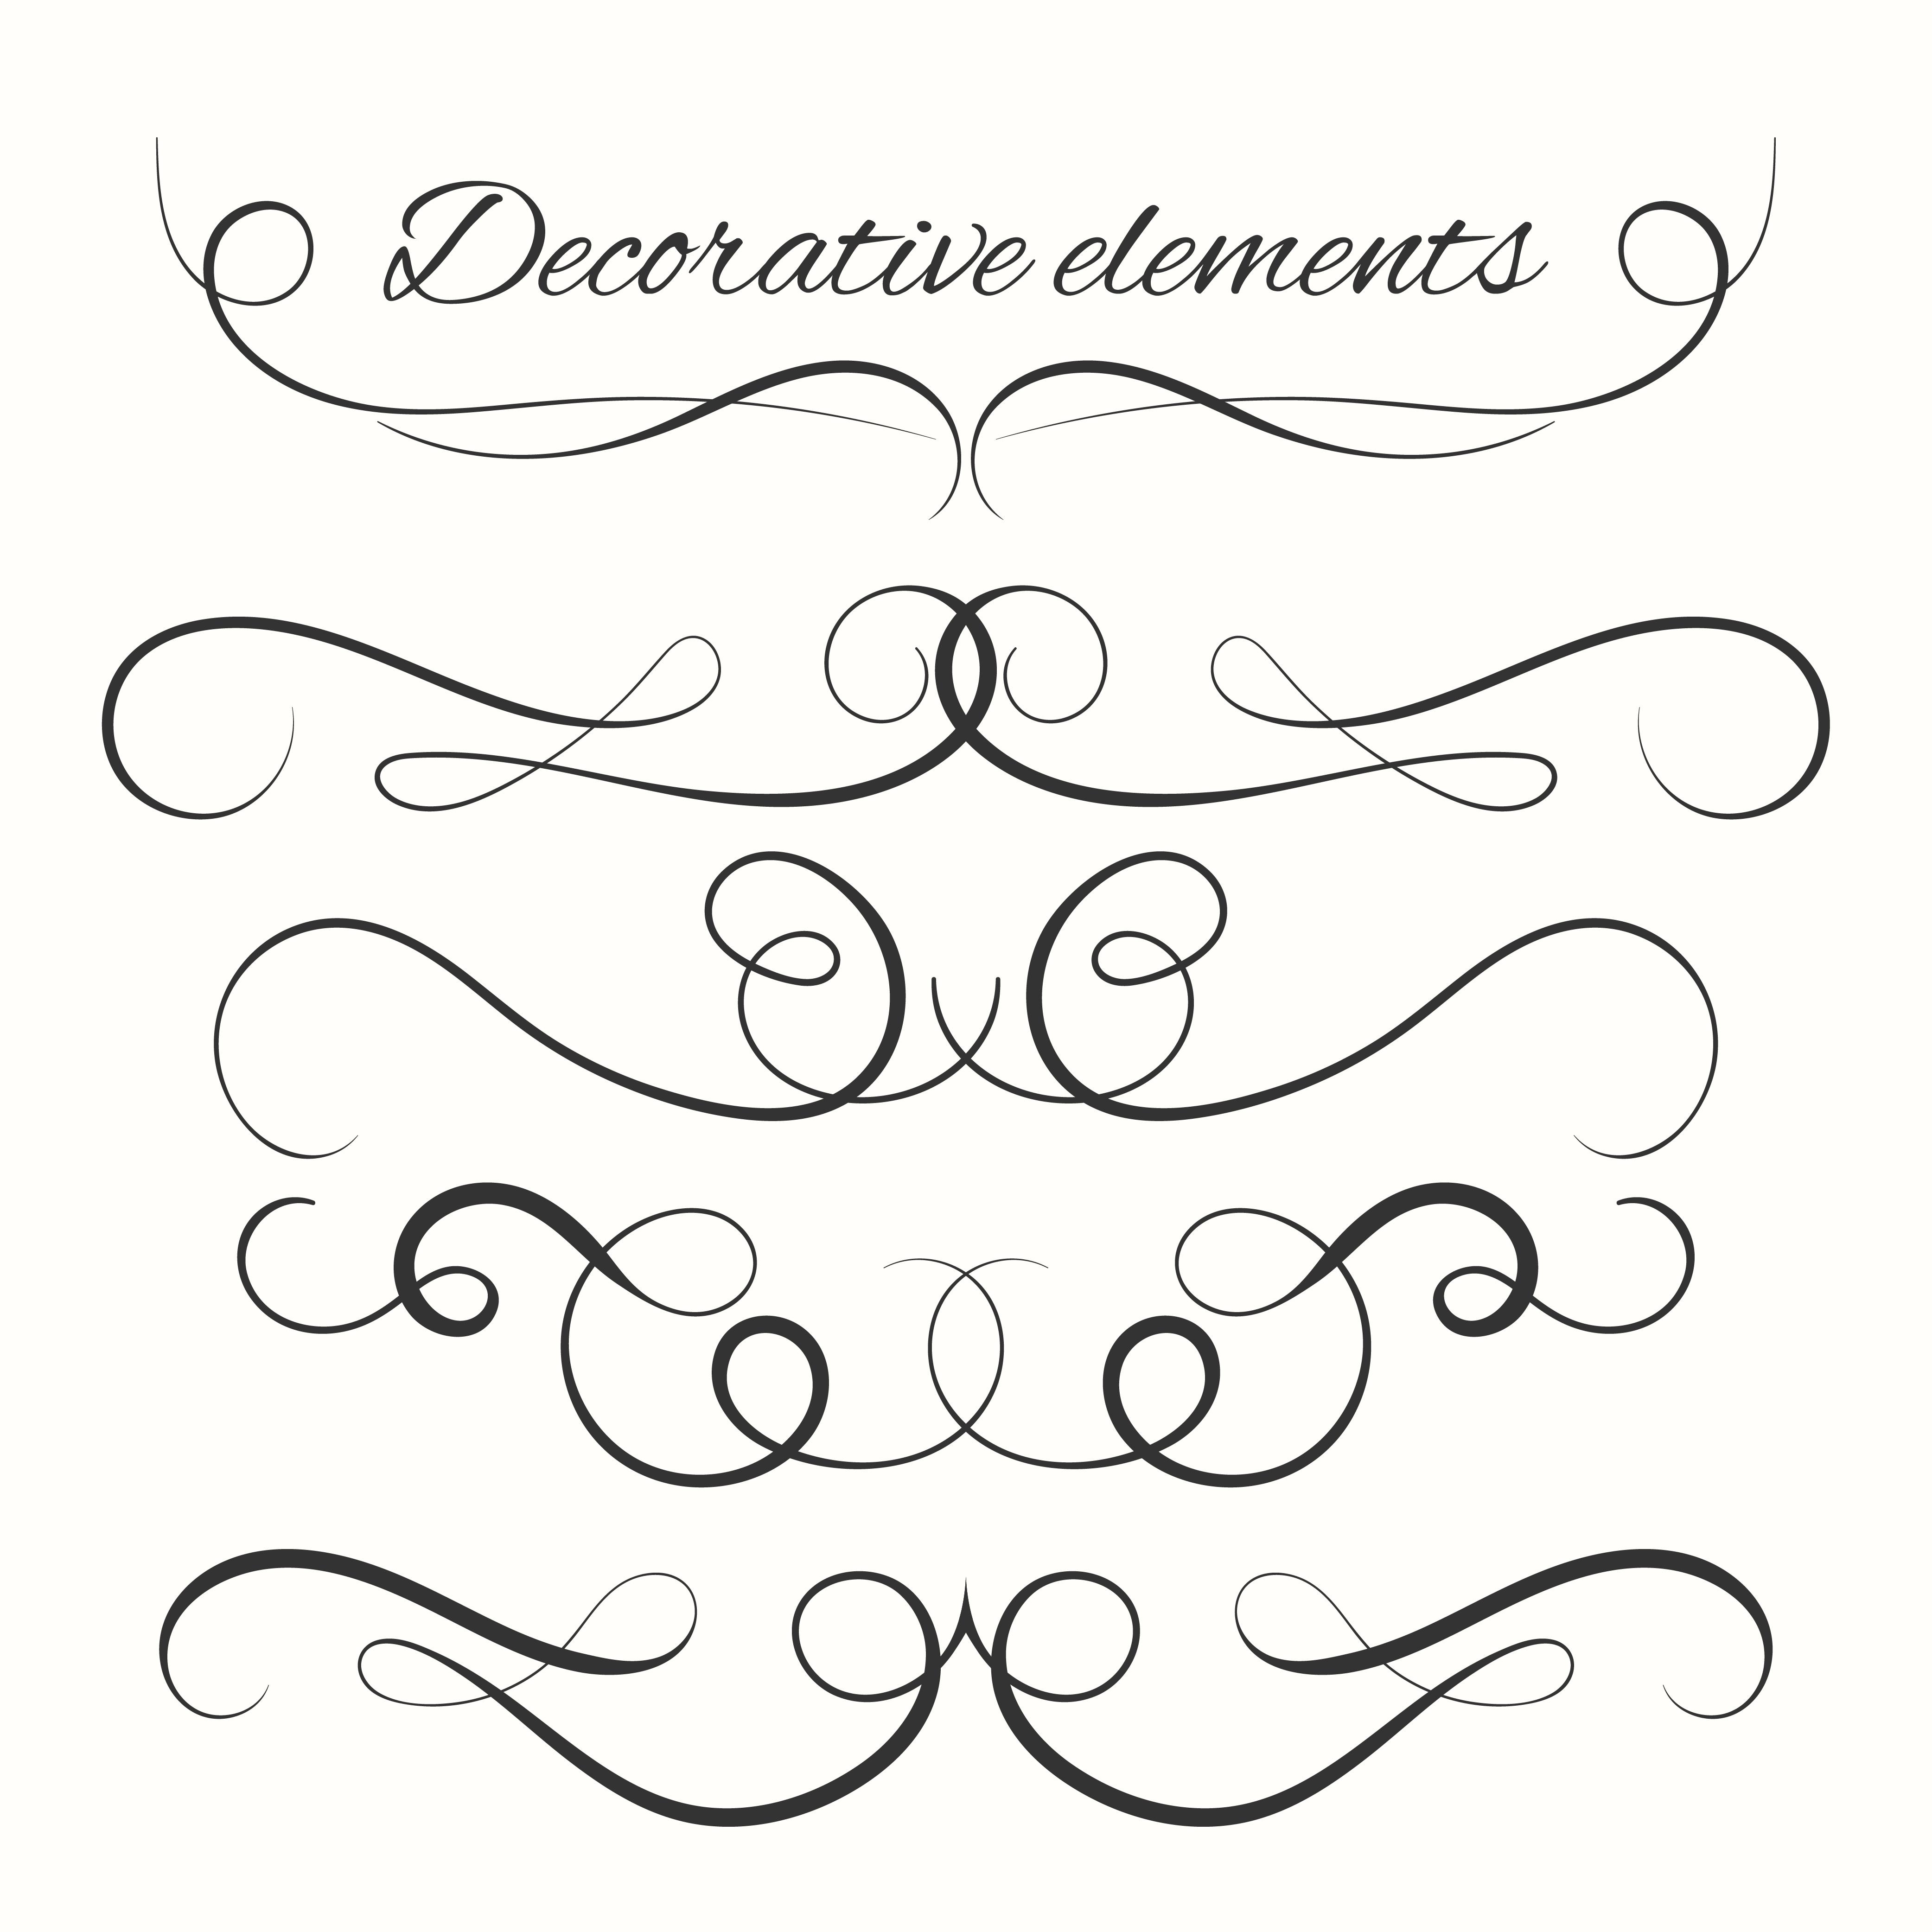 Decorative Lines Free Vector Art - (133,821 Free Downloads)